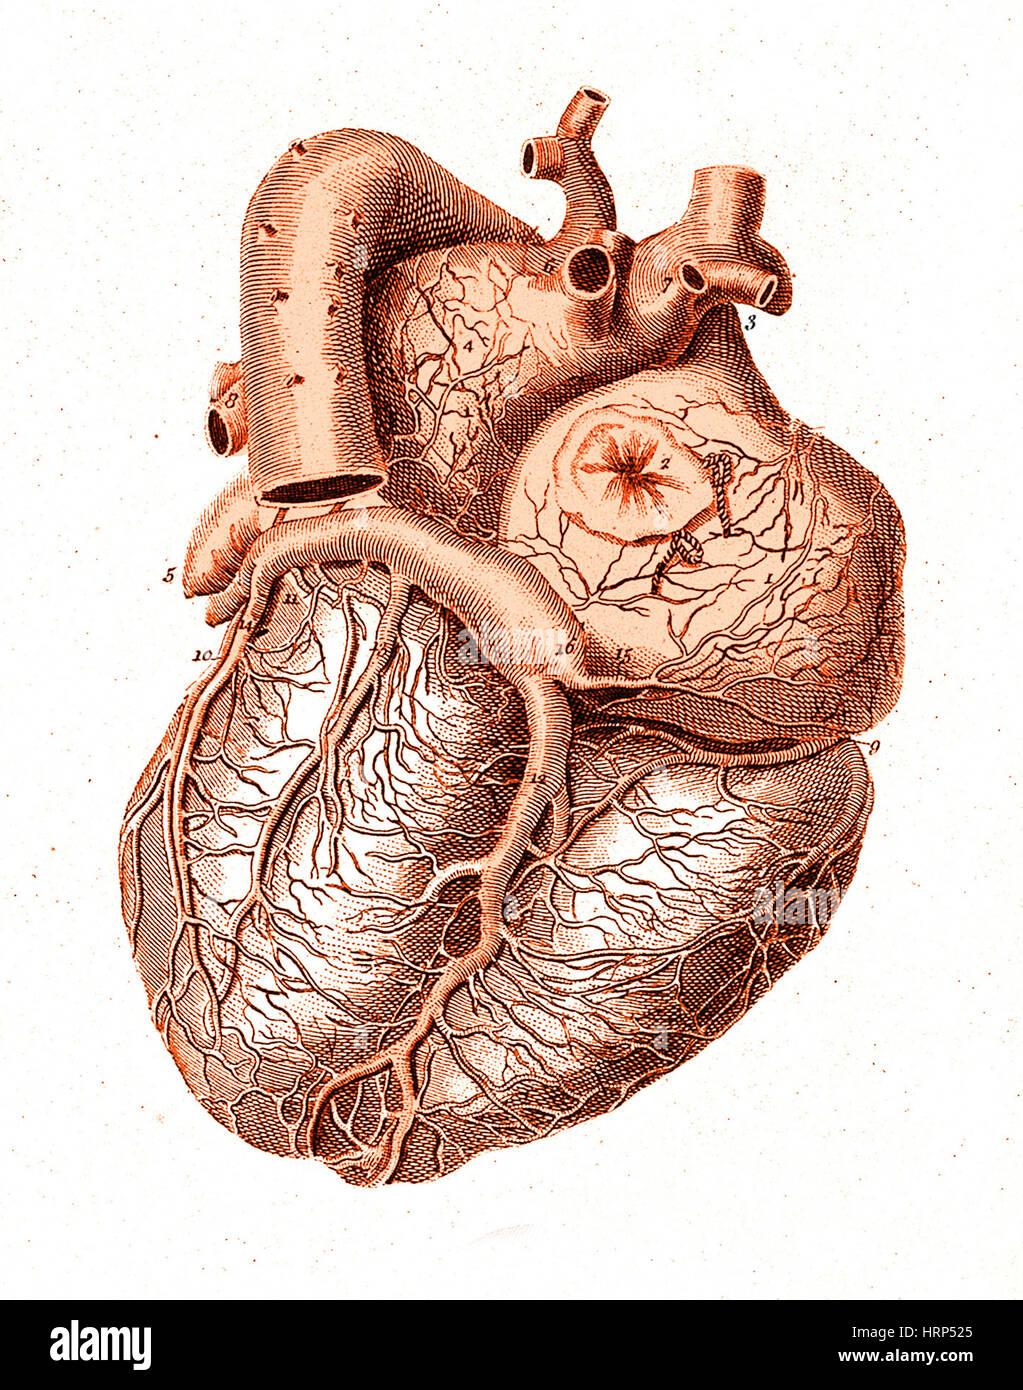 Heart, Anatomical Illustration, 1814 Stock Photo: 135096589 - Alamy